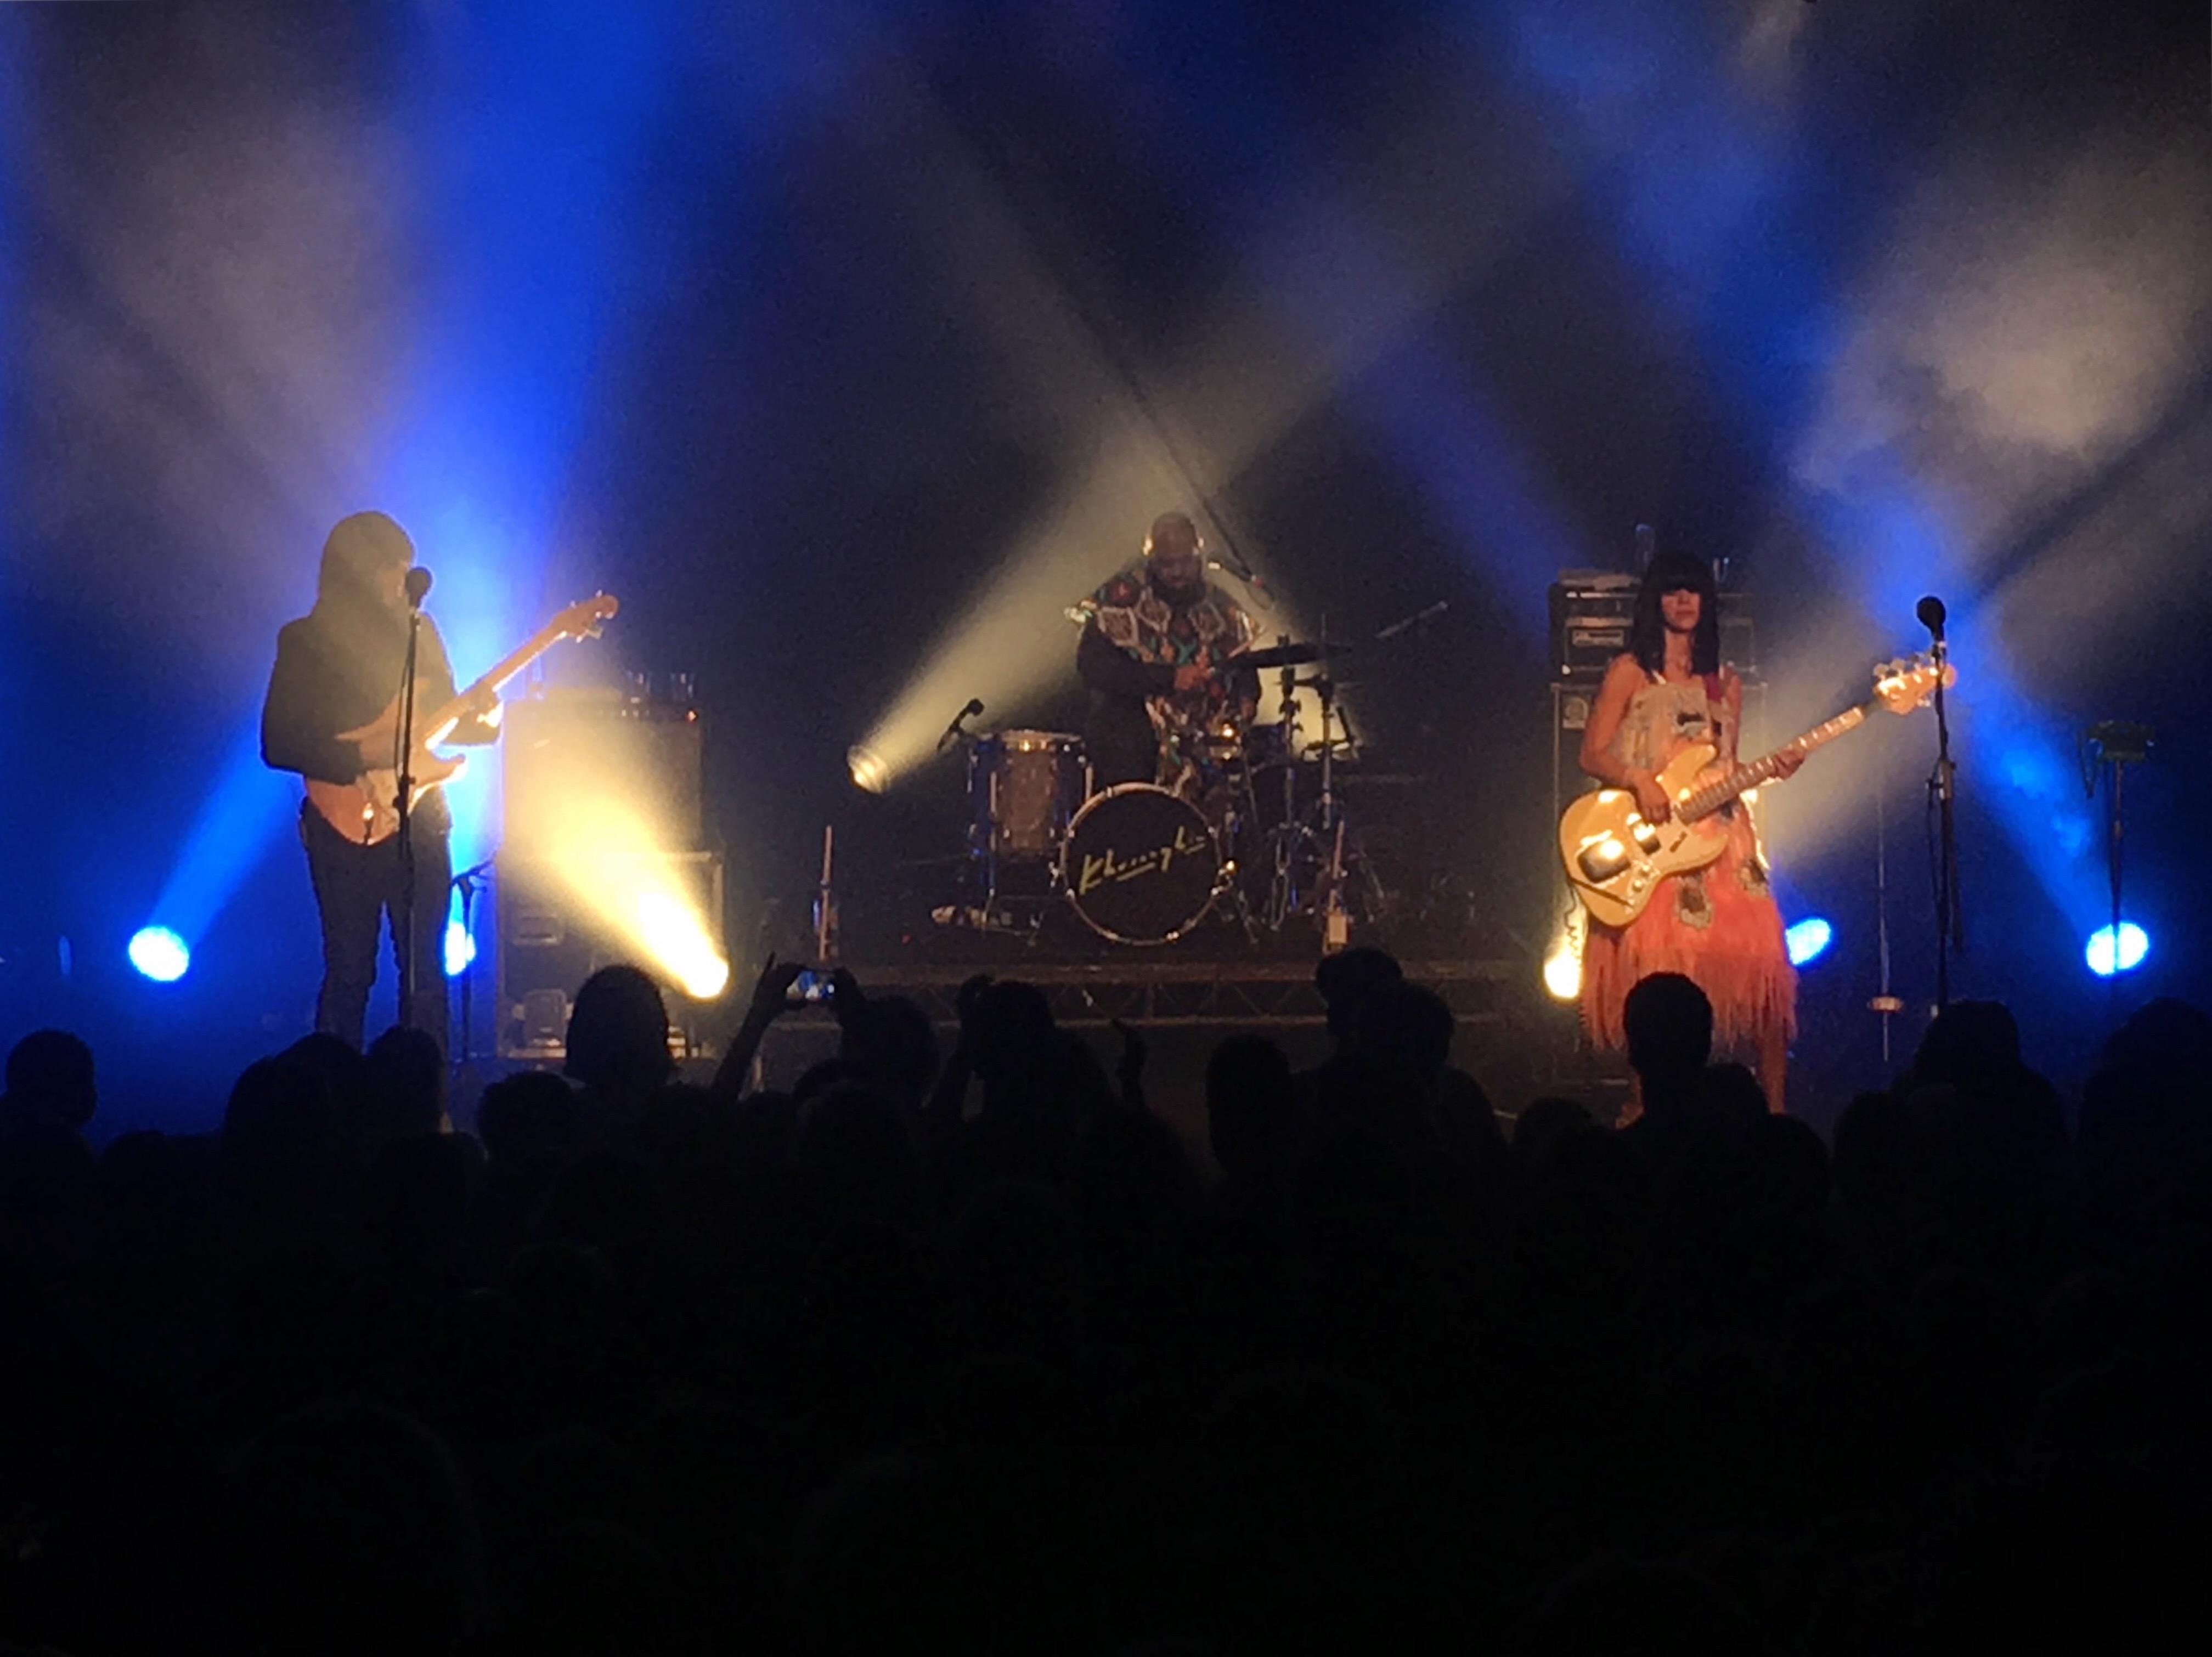 LIVE REVIEW: Khruangbin @ Metro Theatre, Sydney – Doubtful